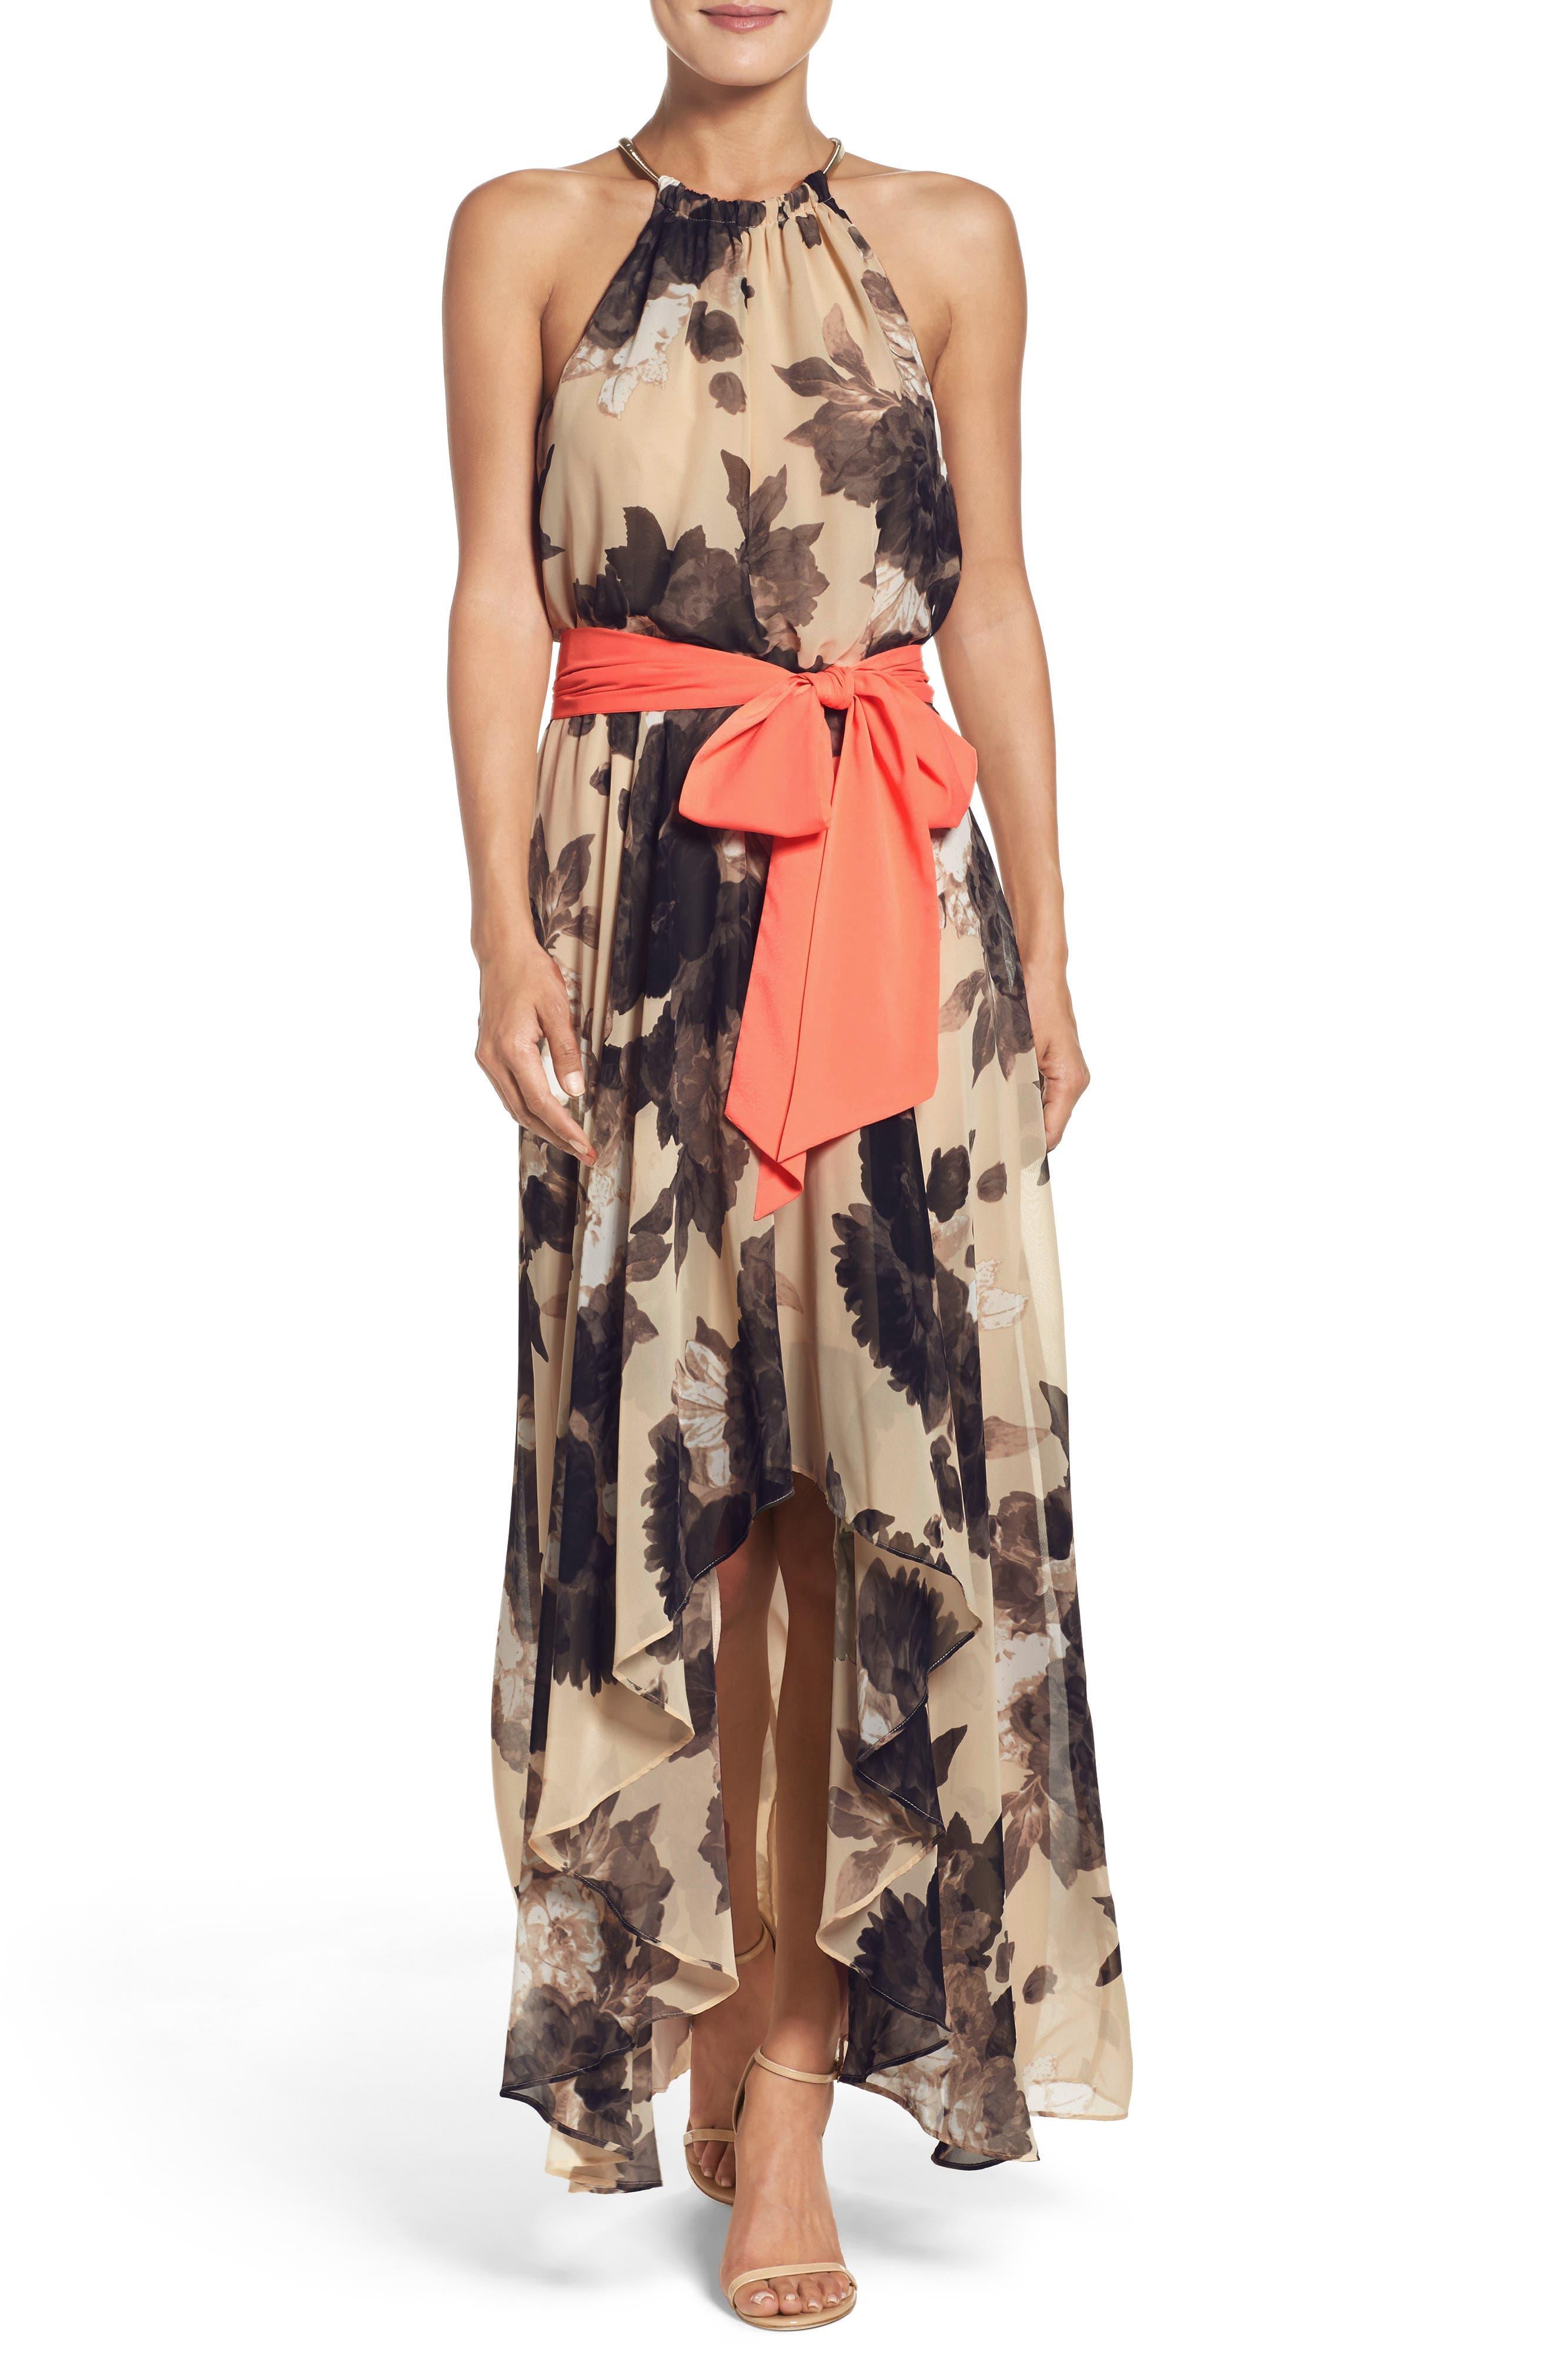 ELIZA J, Floral Print Halter Chiffon Maxi Dress, Main thumbnail 1, color, 250